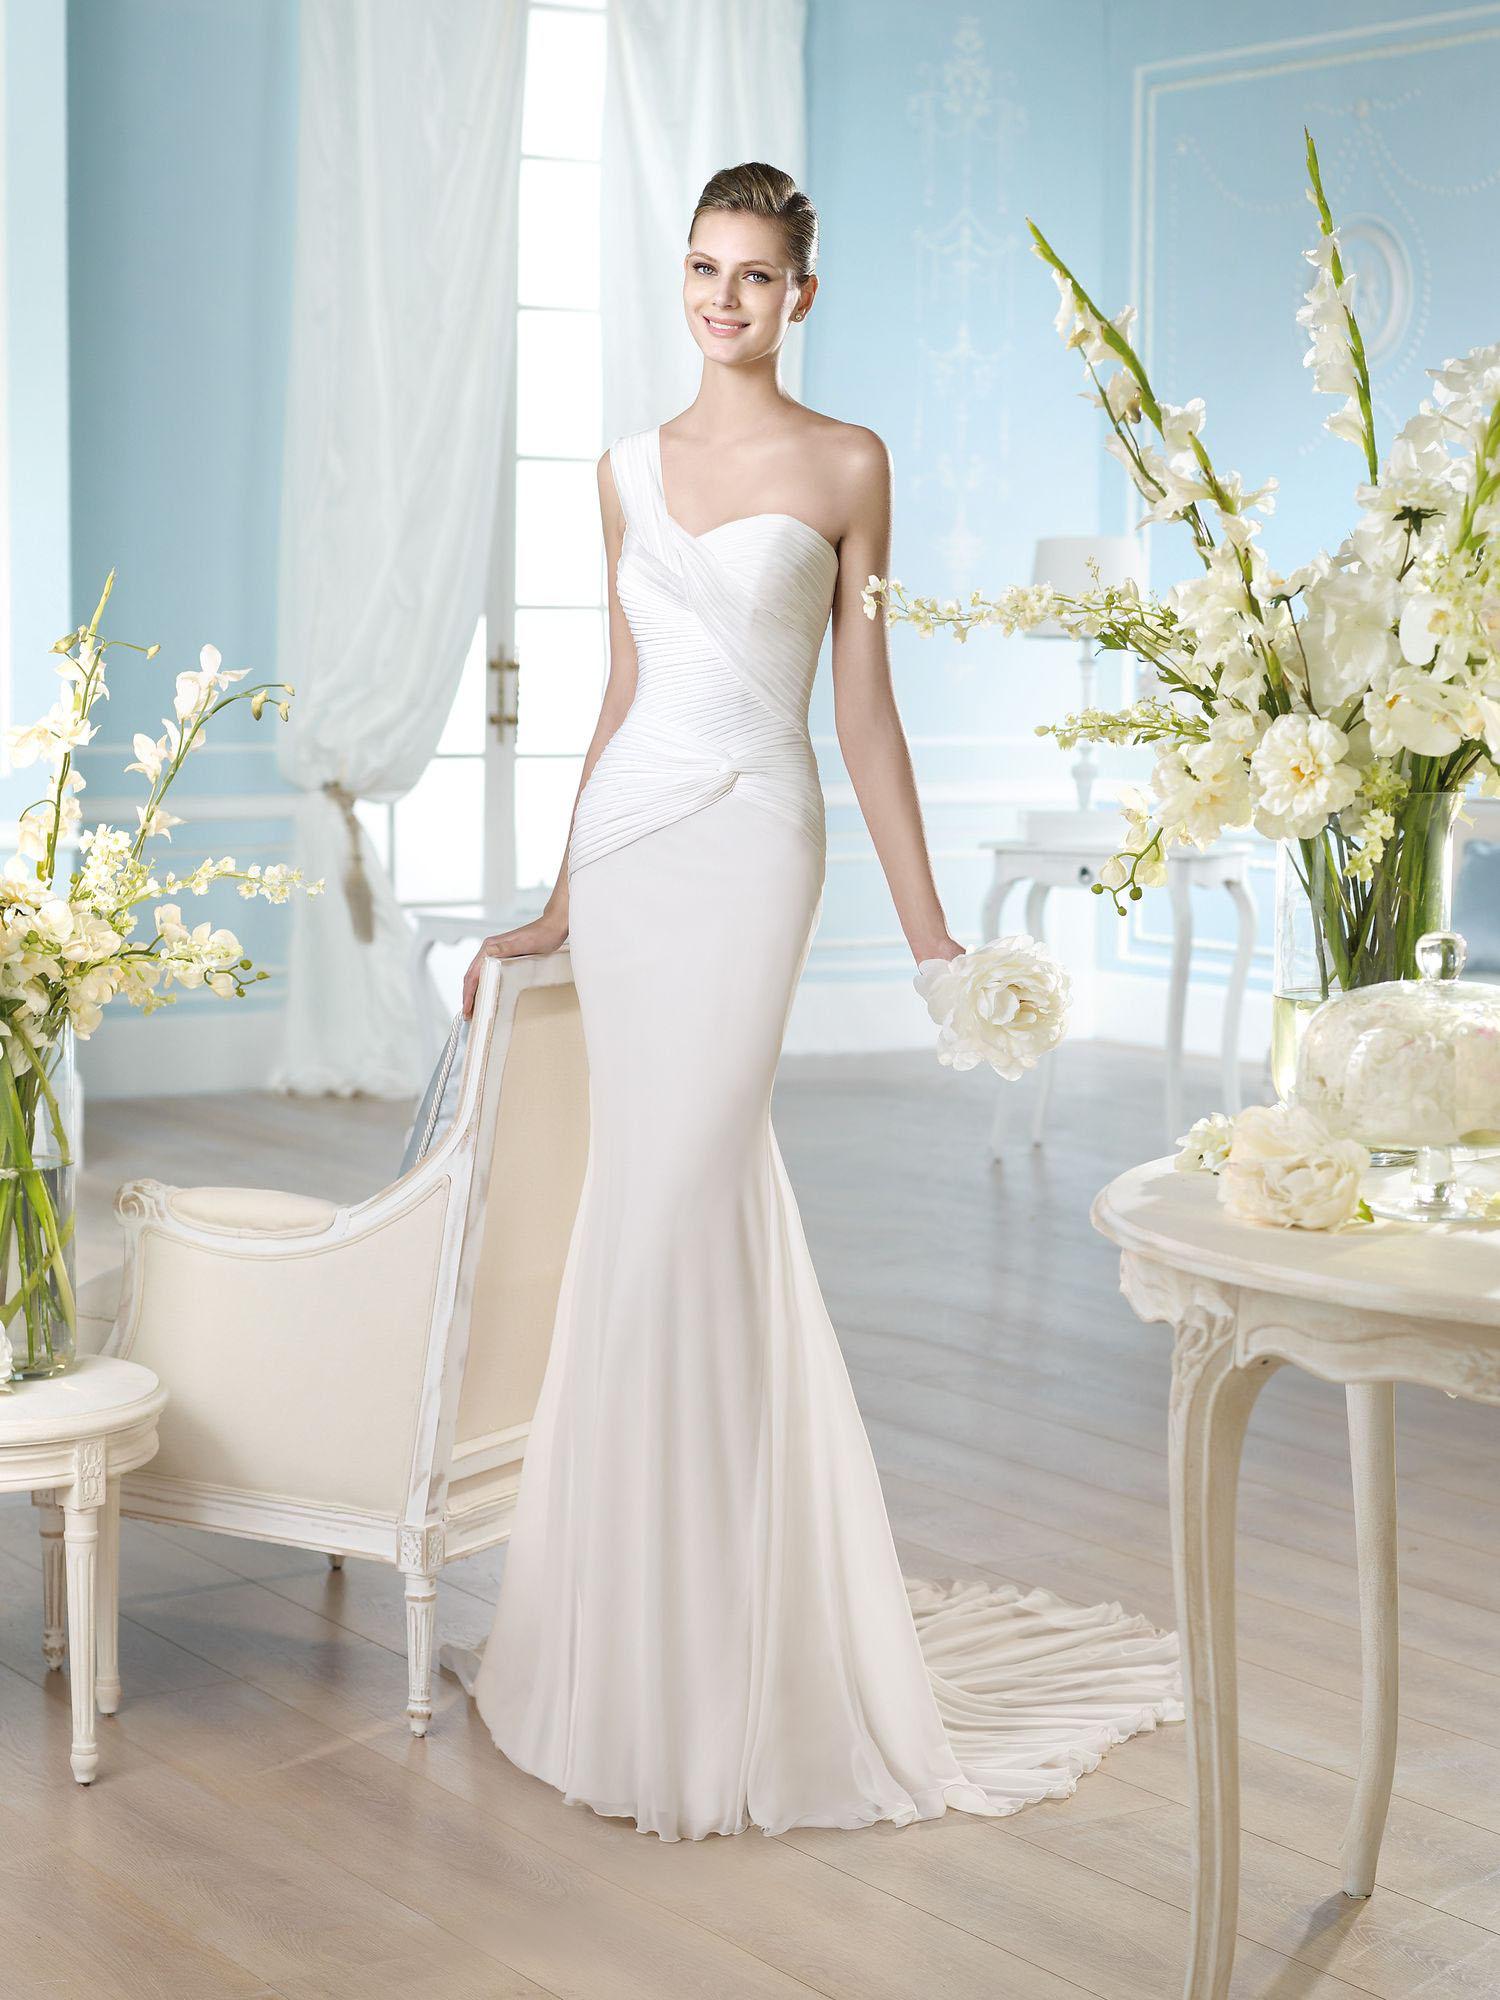 ROBE de mariée MOUSSELINE HABIDD soniab marseille 13007